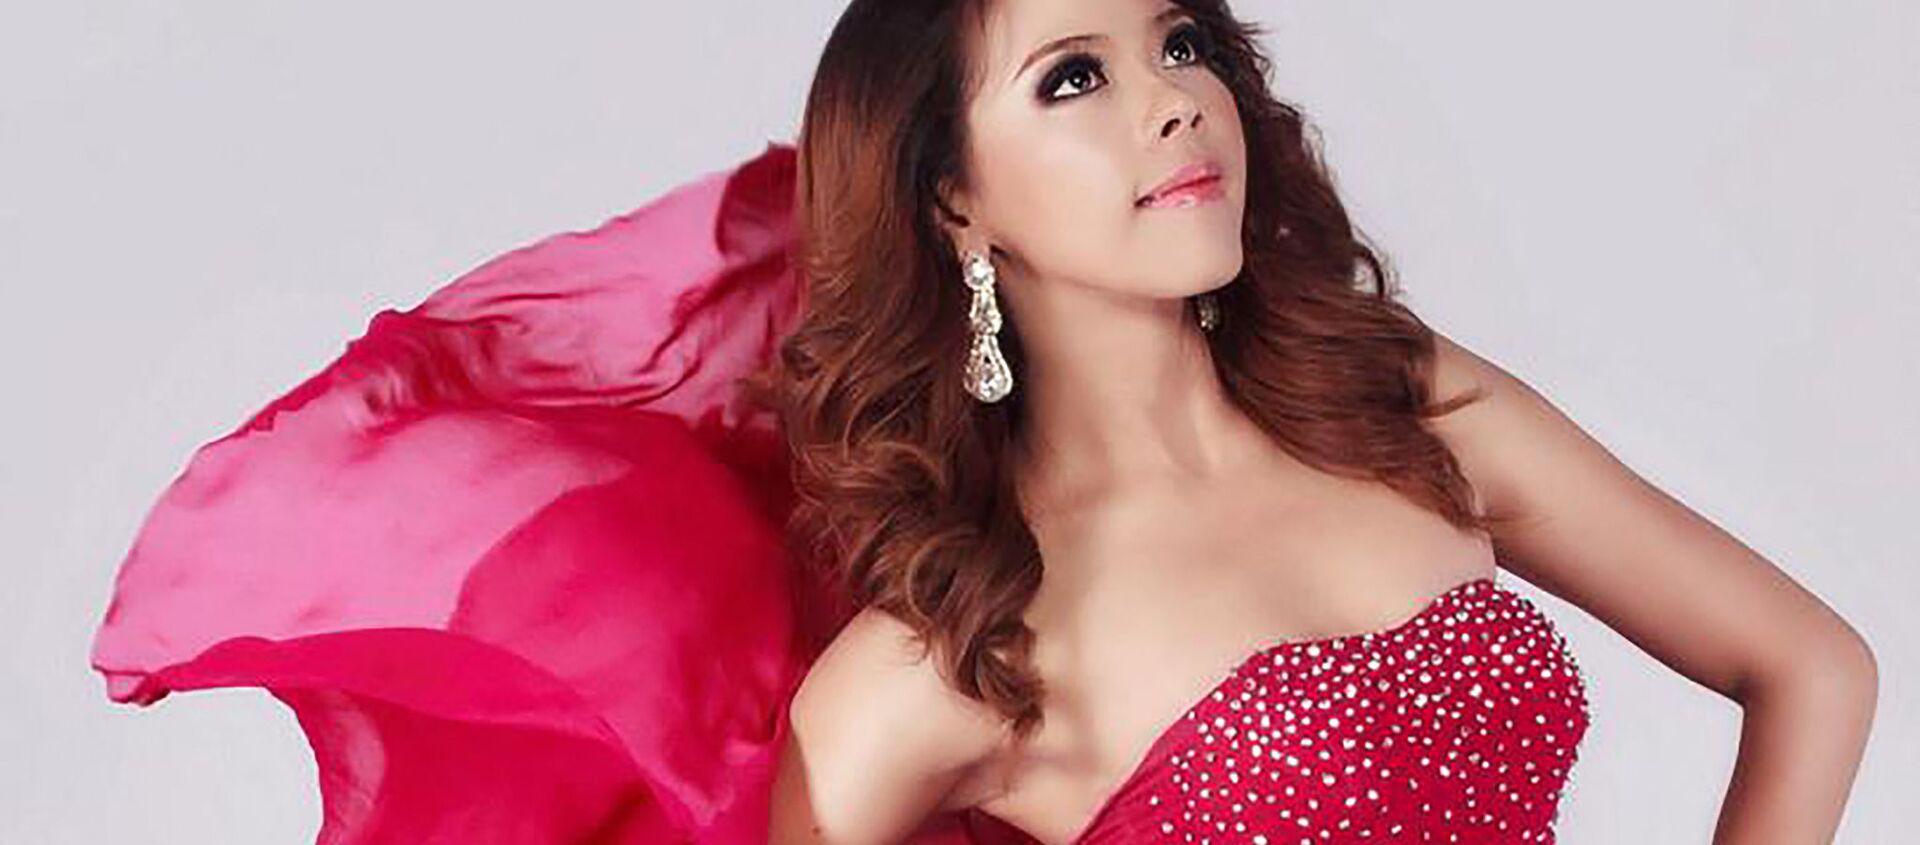 Htar Htet Htet tham gia cuộc thi sắc đẹp Miss Grand International tại Bangkok, năm 2013 - Sputnik Việt Nam, 1920, 17.05.2021